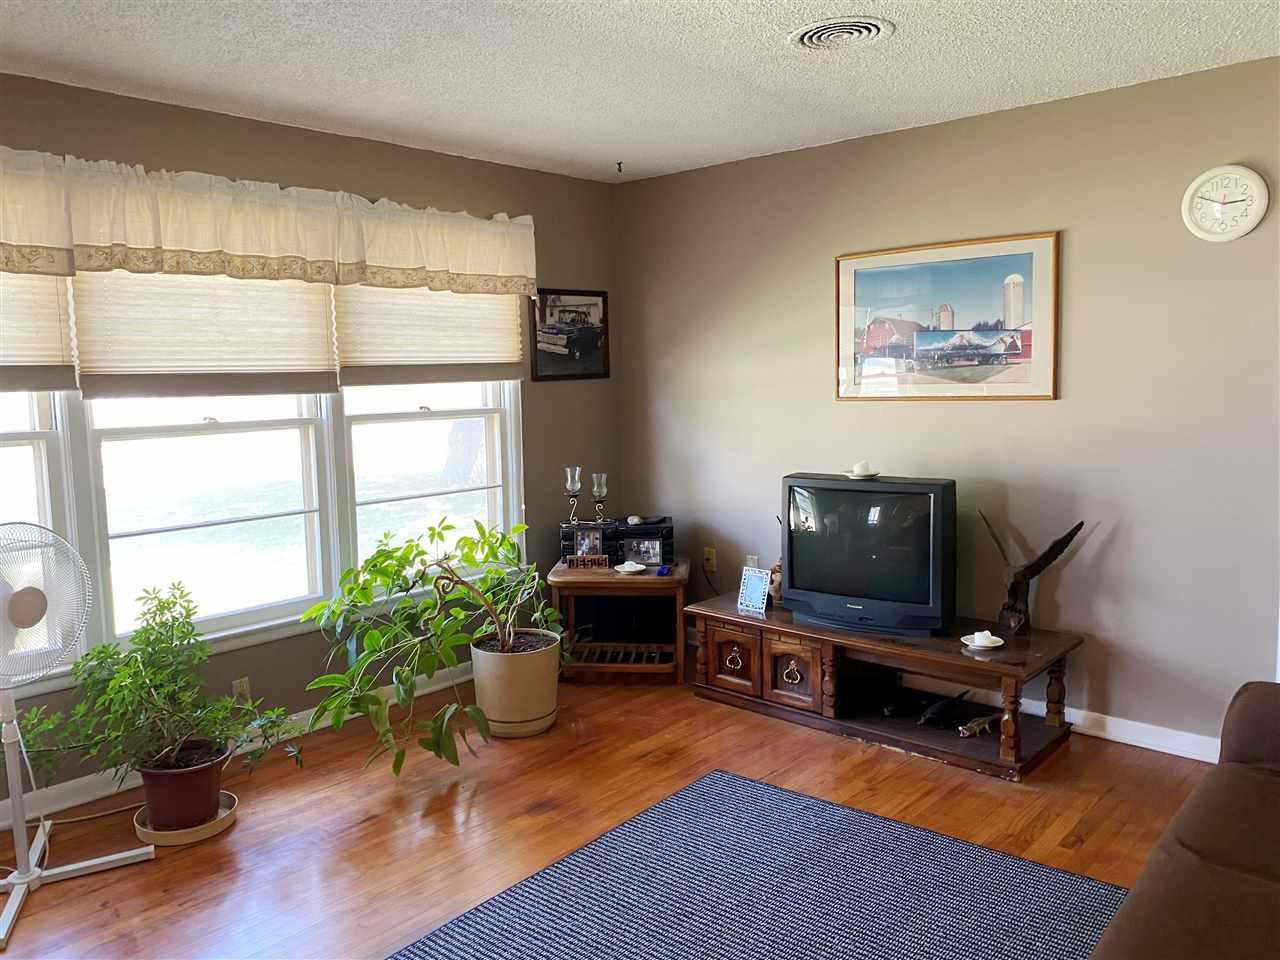 For Sale: 836 N Anthony Ave, Anthony KS